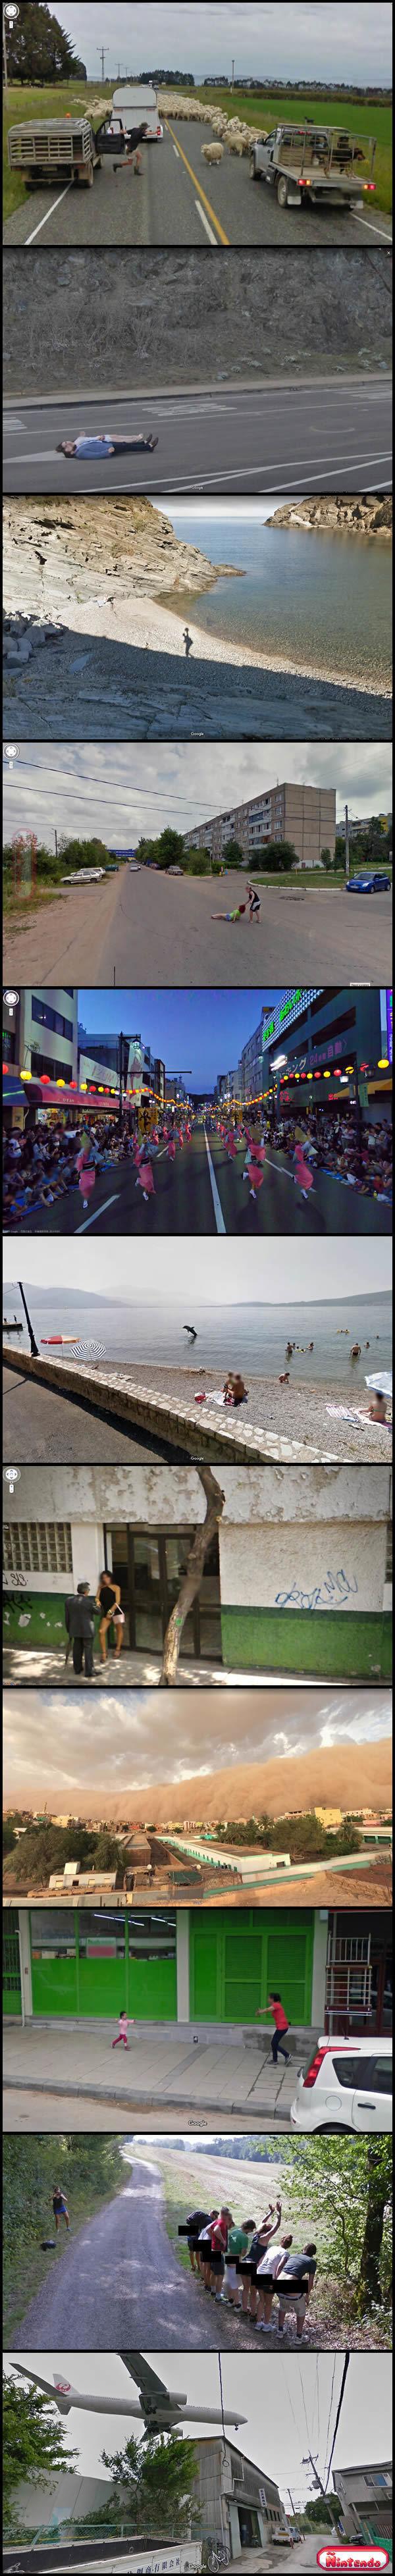 Imagens Surpreendentes De 2021 Do Google Street View